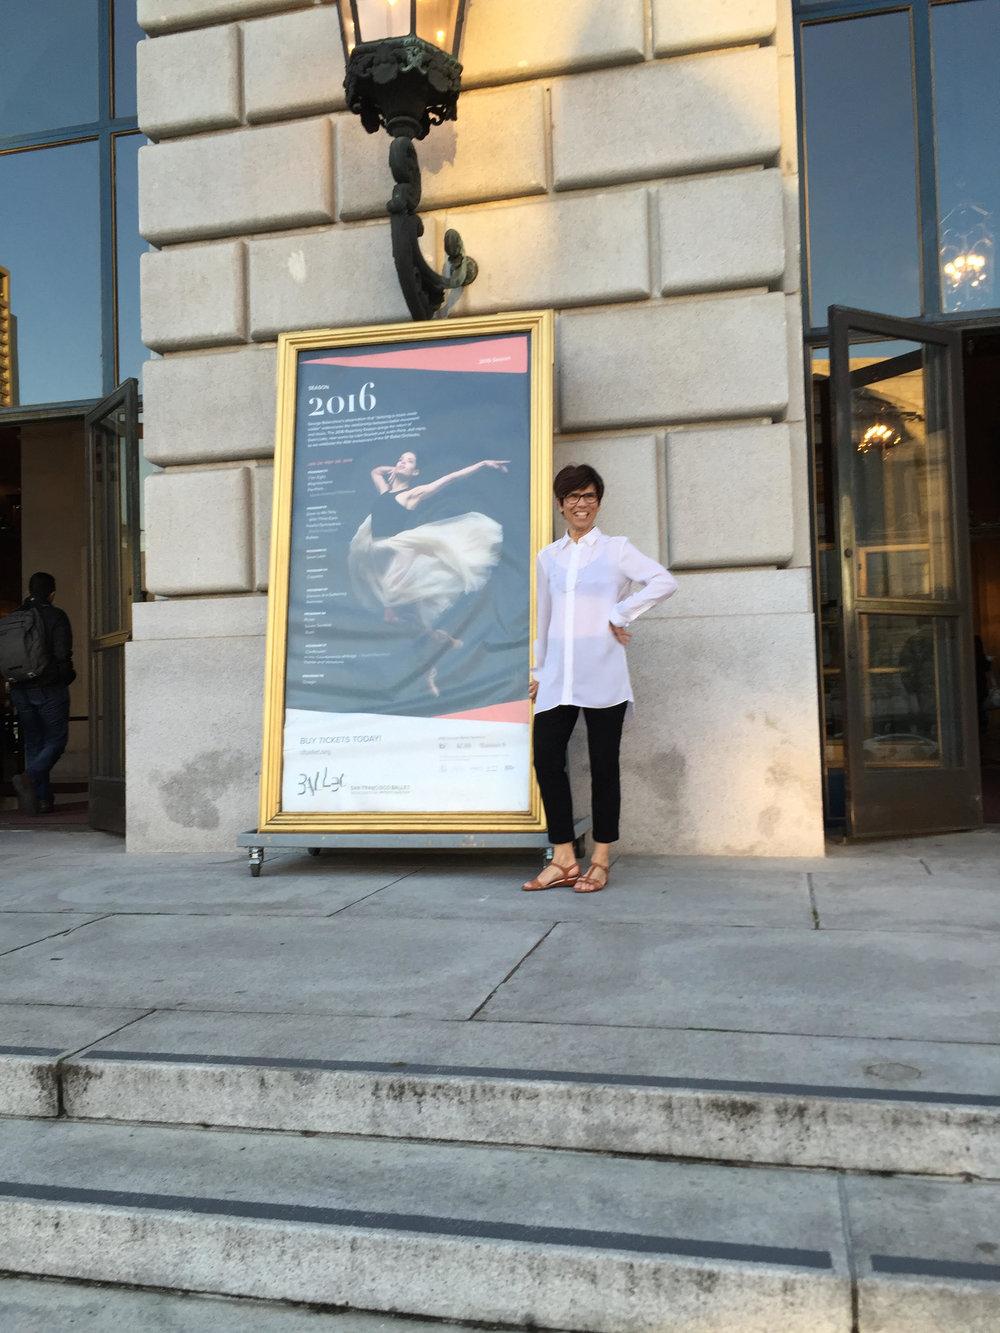 Kathy Adams visiting San Francisco to see the work of Justin Peck